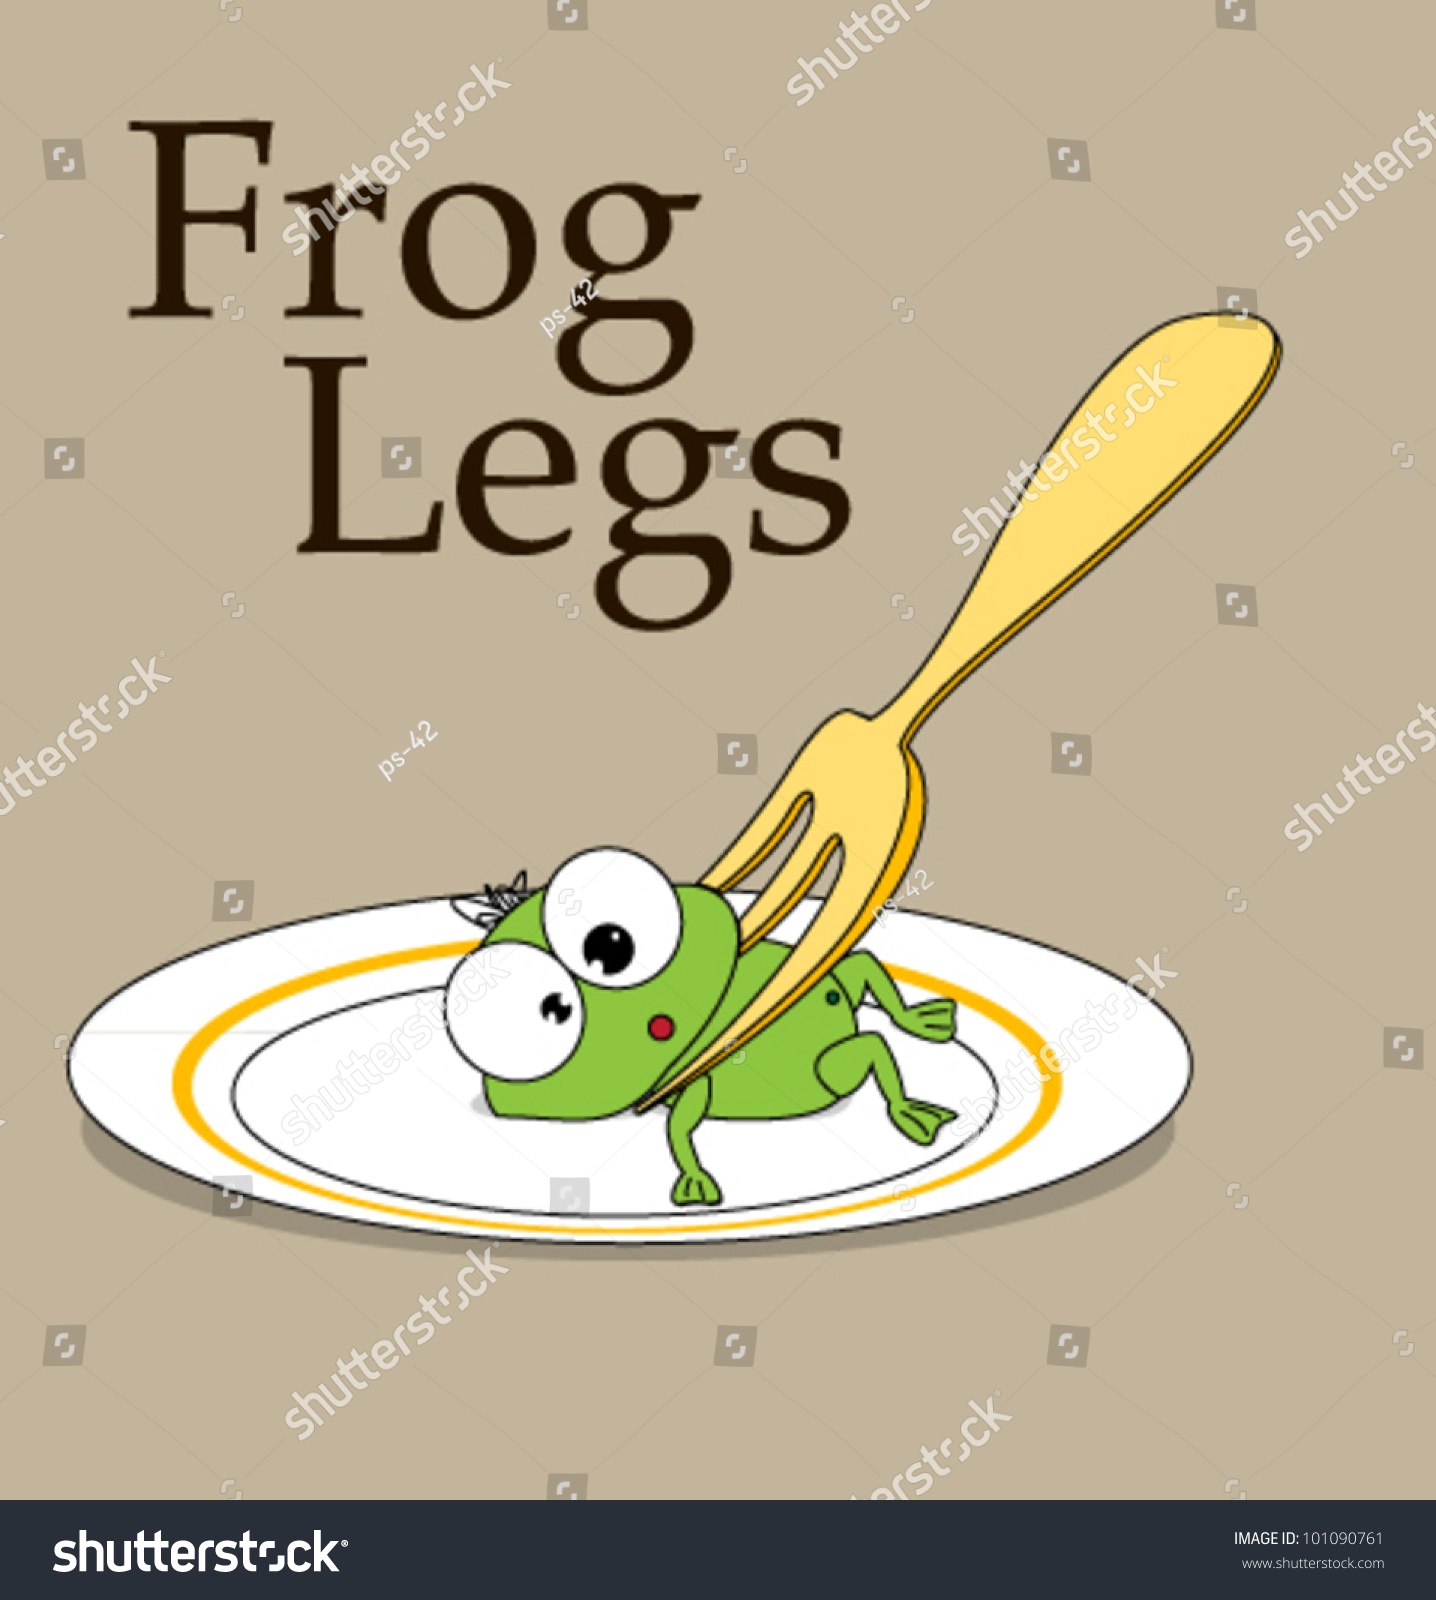 frog legs delicacy humor stock vector royalty free 101090761 rh shutterstock com Turtle Vector Vector The Crocodile